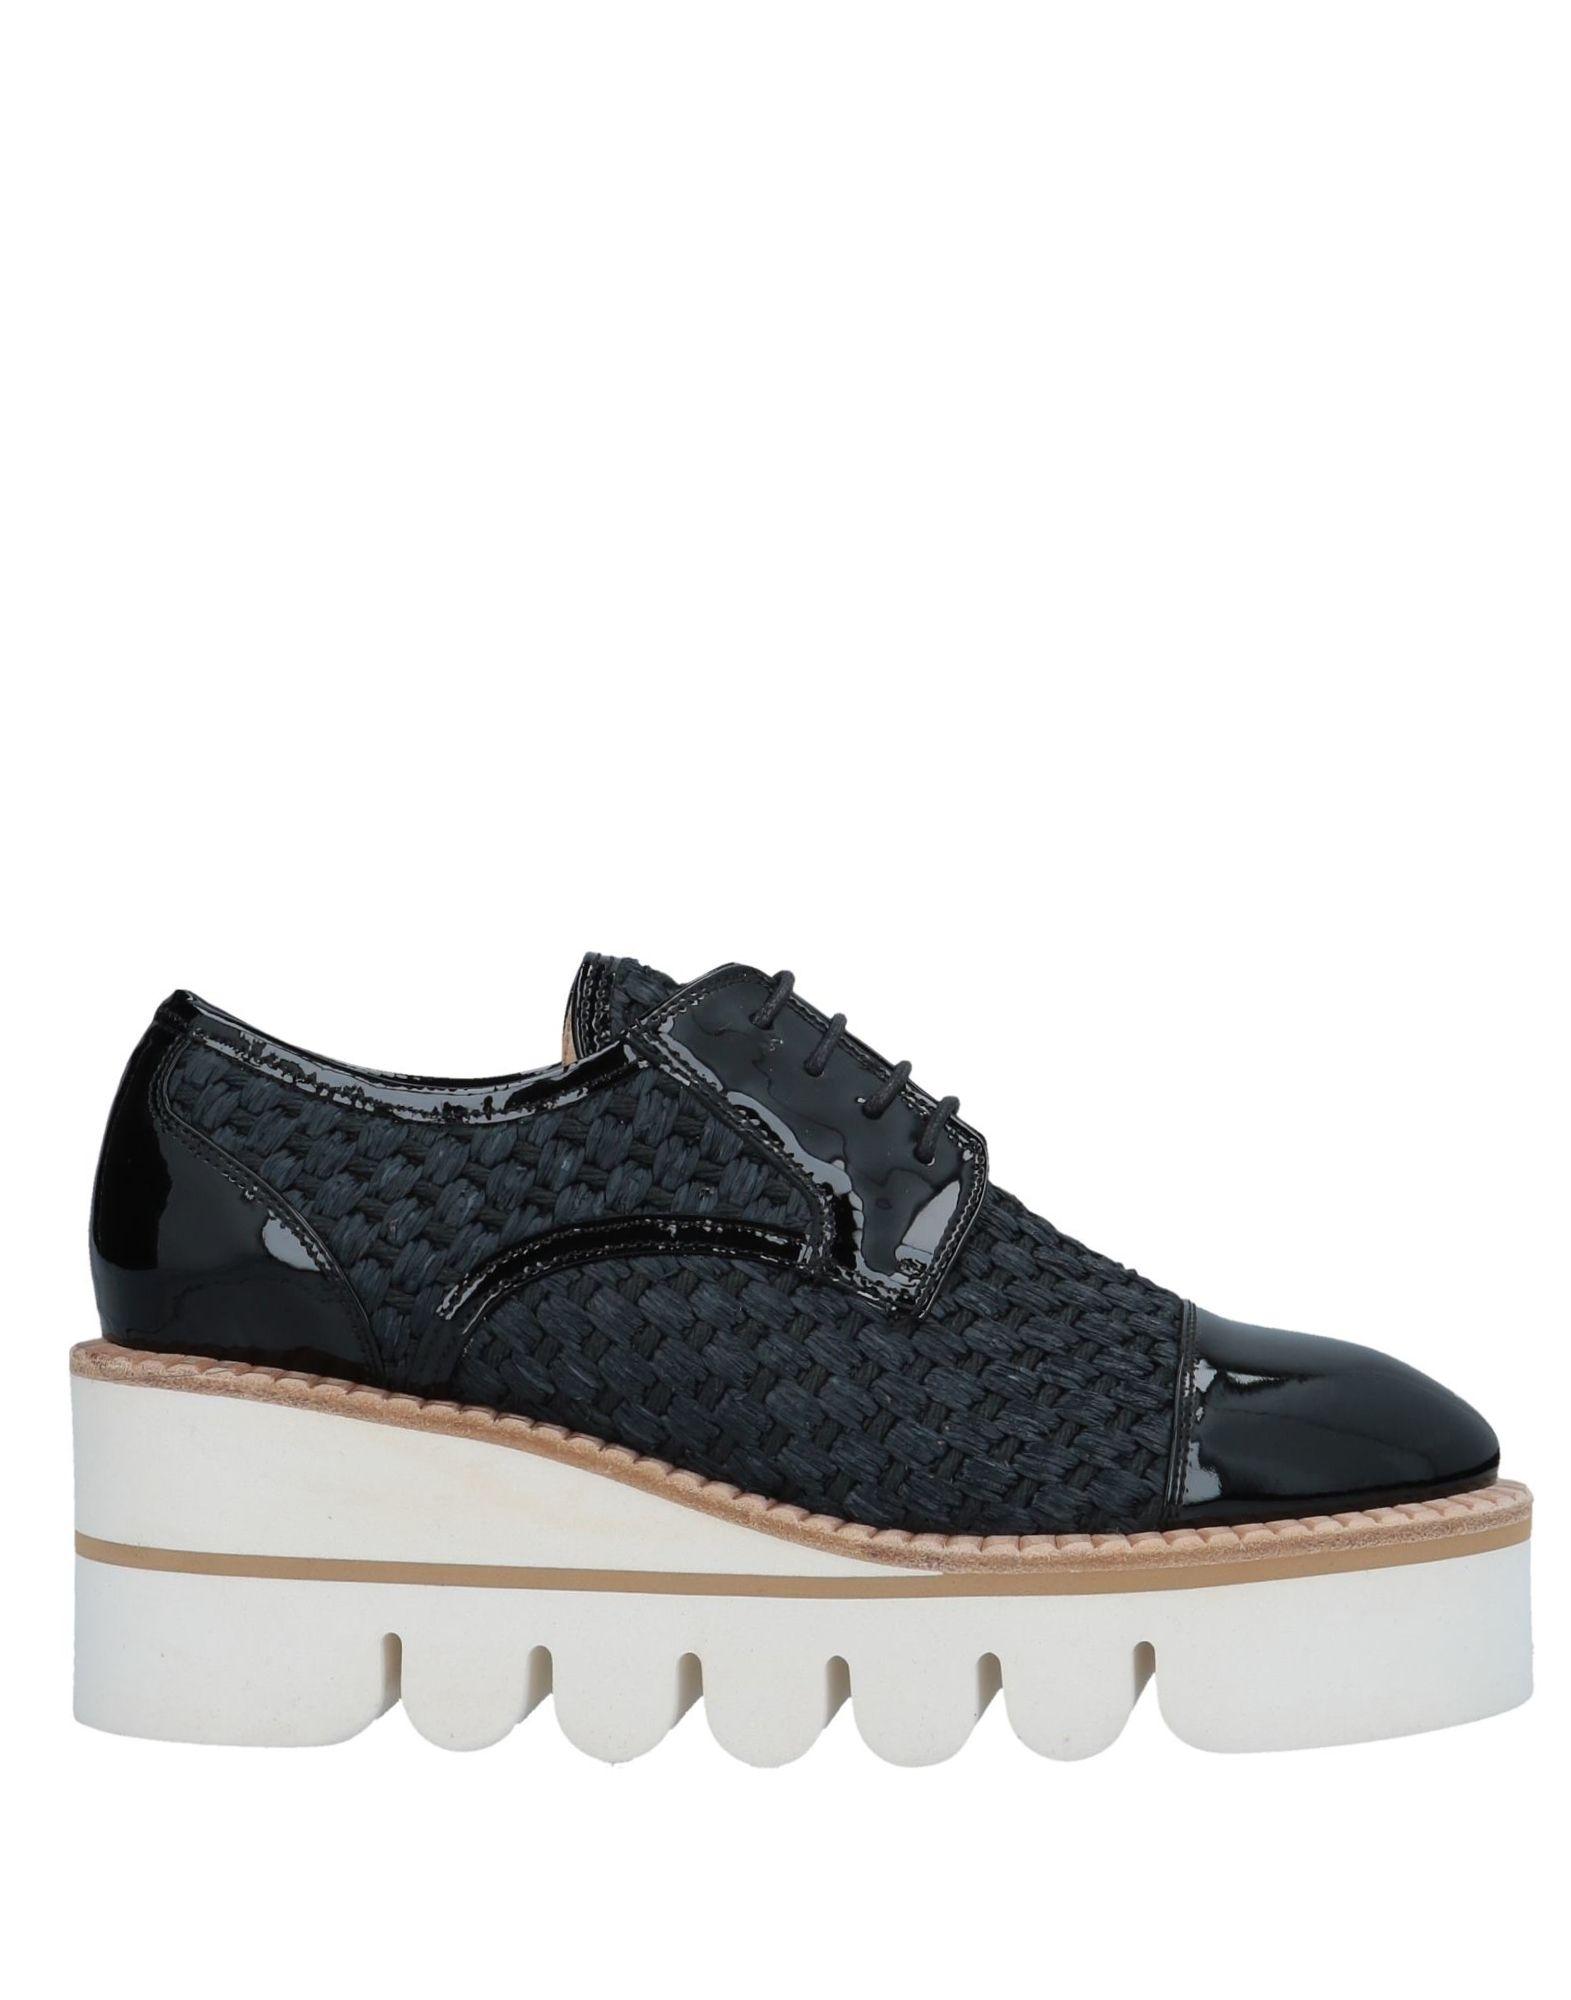 Фото - BALLIN Обувь на шнурках обувь на высокой платформе dkny